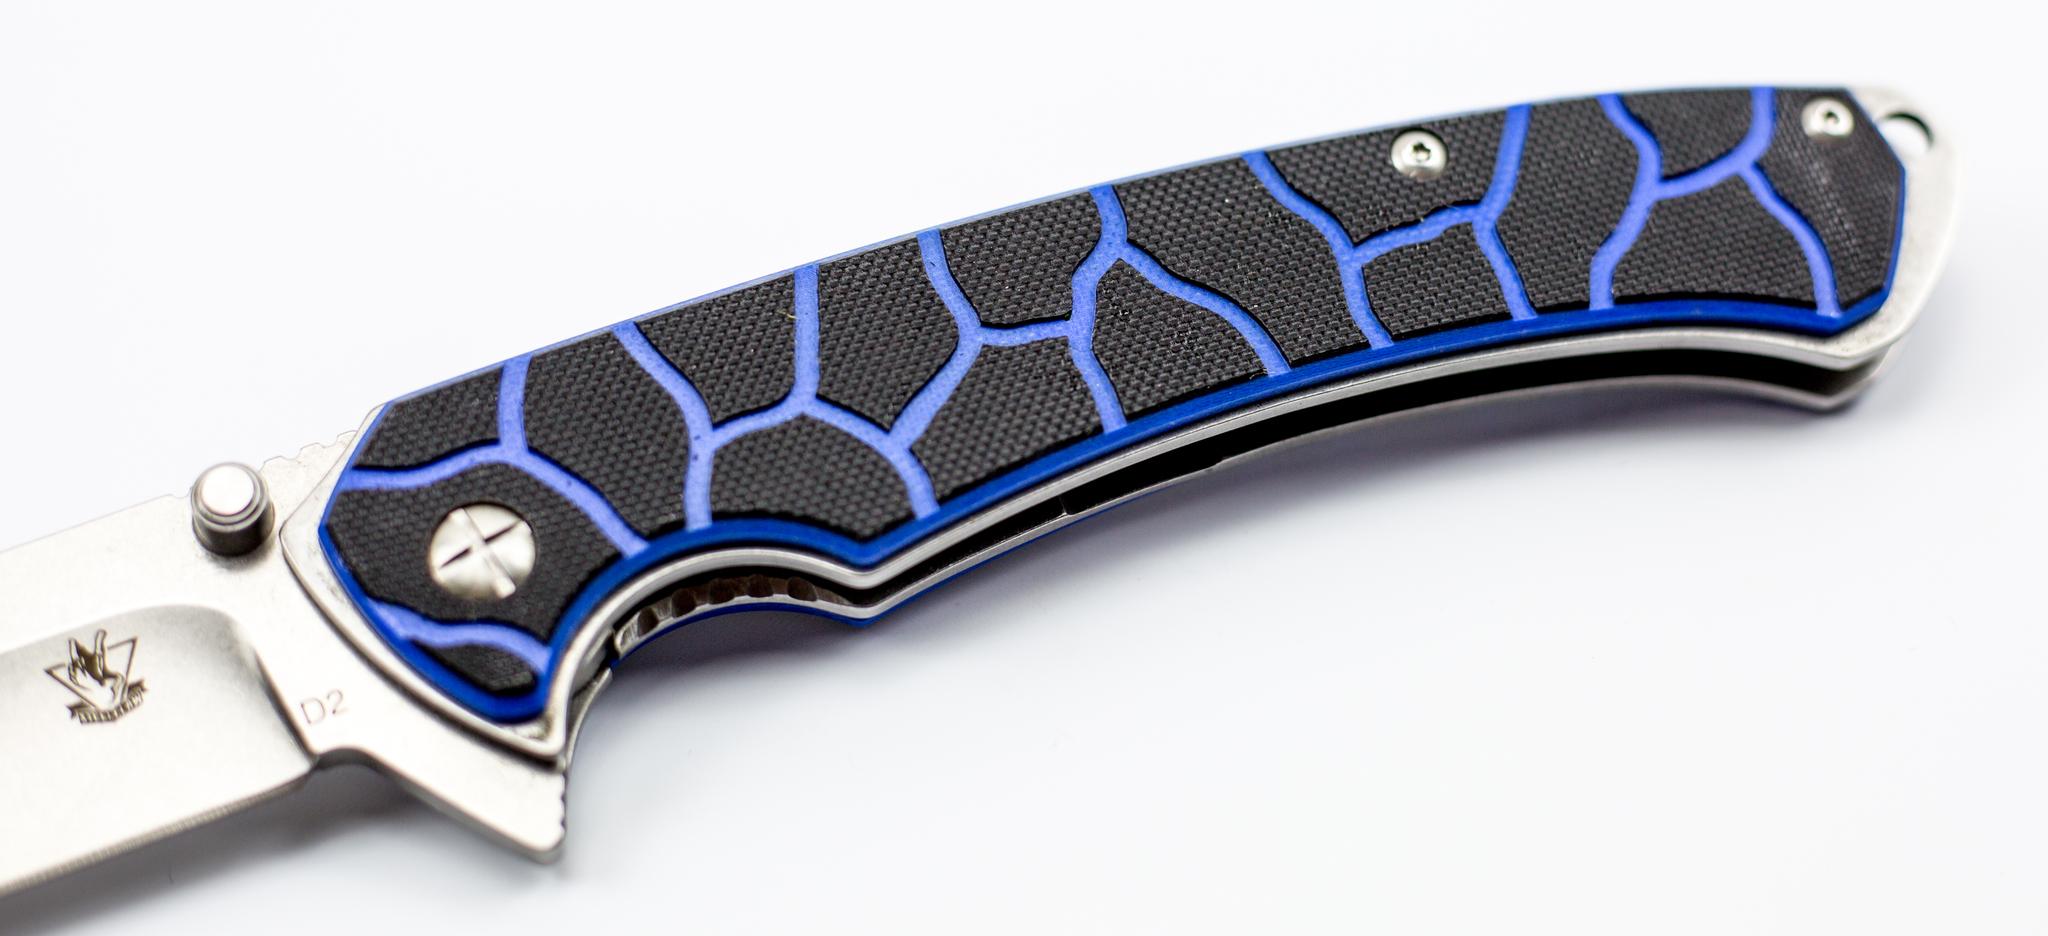 Фото 4 - Нож Лед-2, D2 от Steelclaw